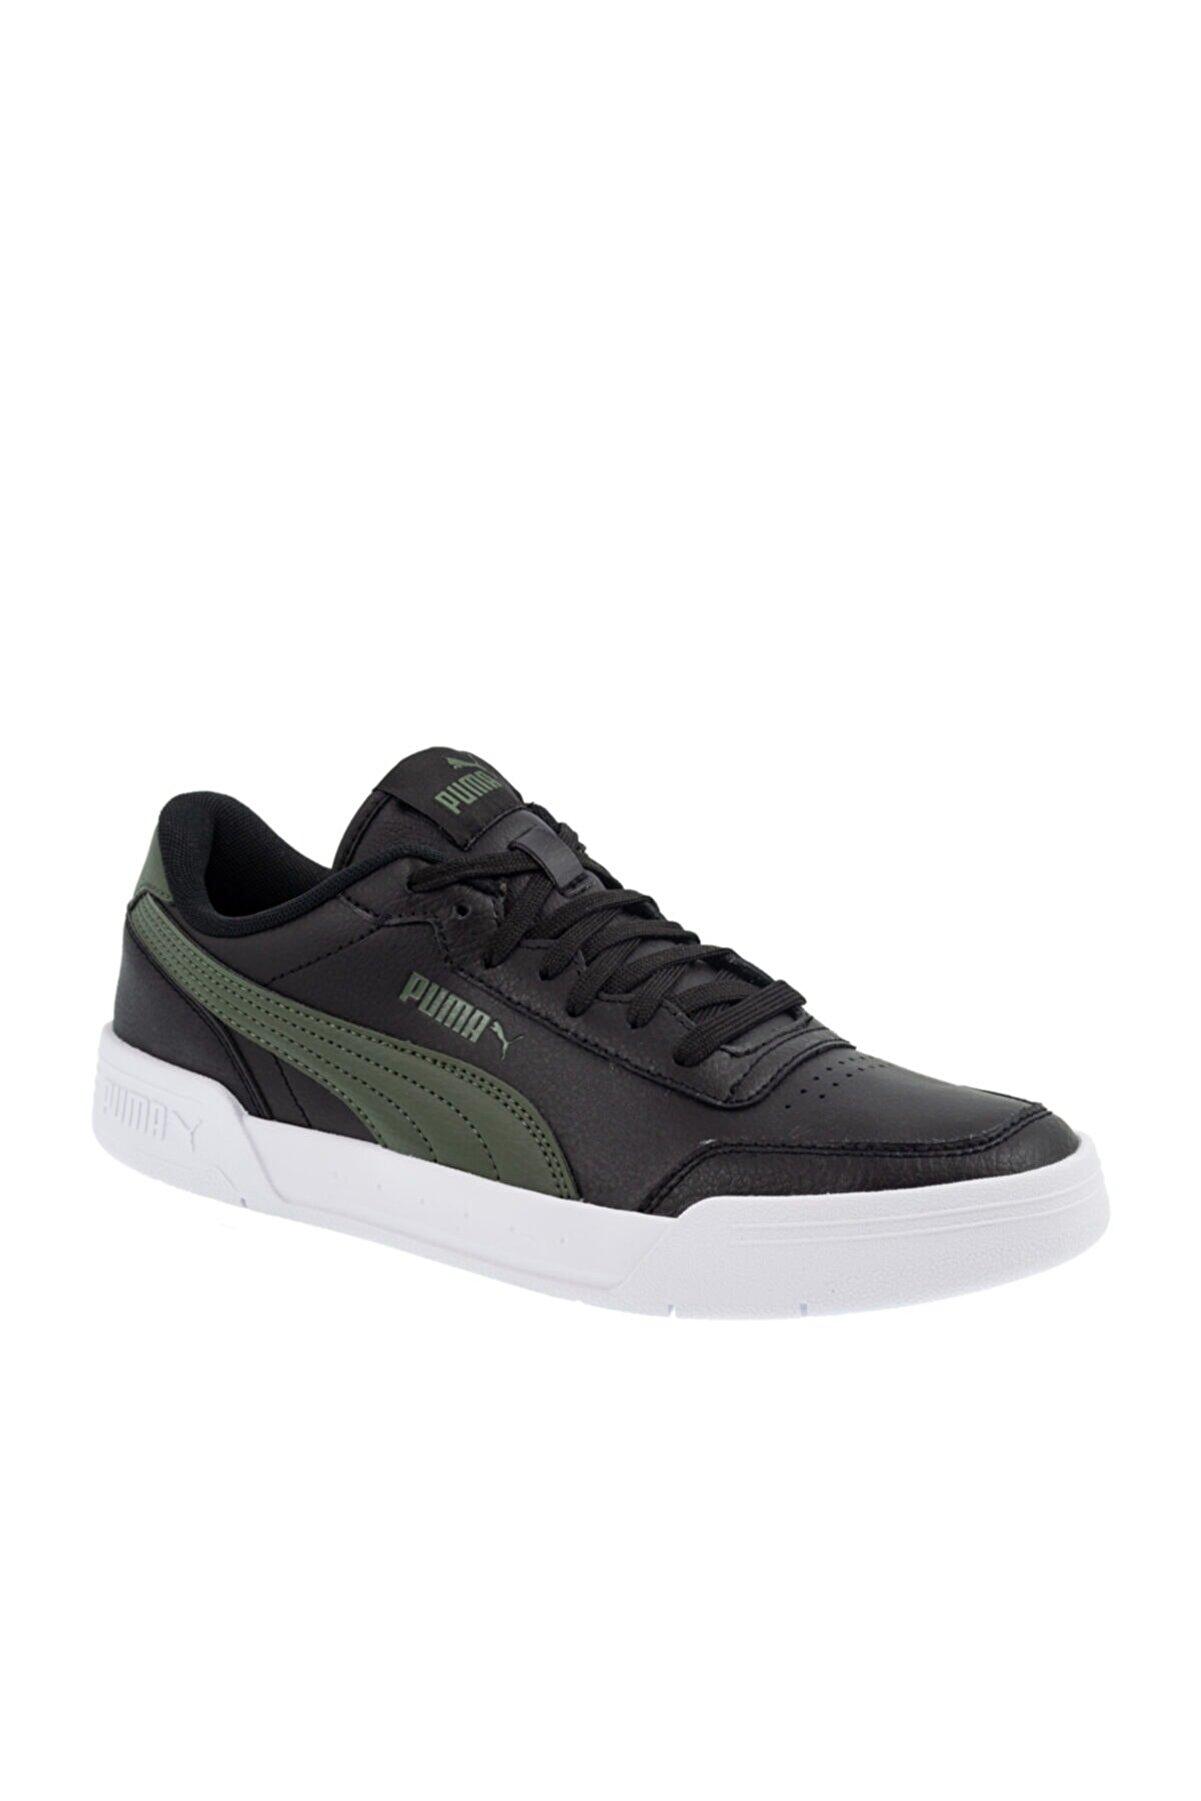 Puma CARACAL Siyah Erkek Sneaker Ayakkabı 100641441